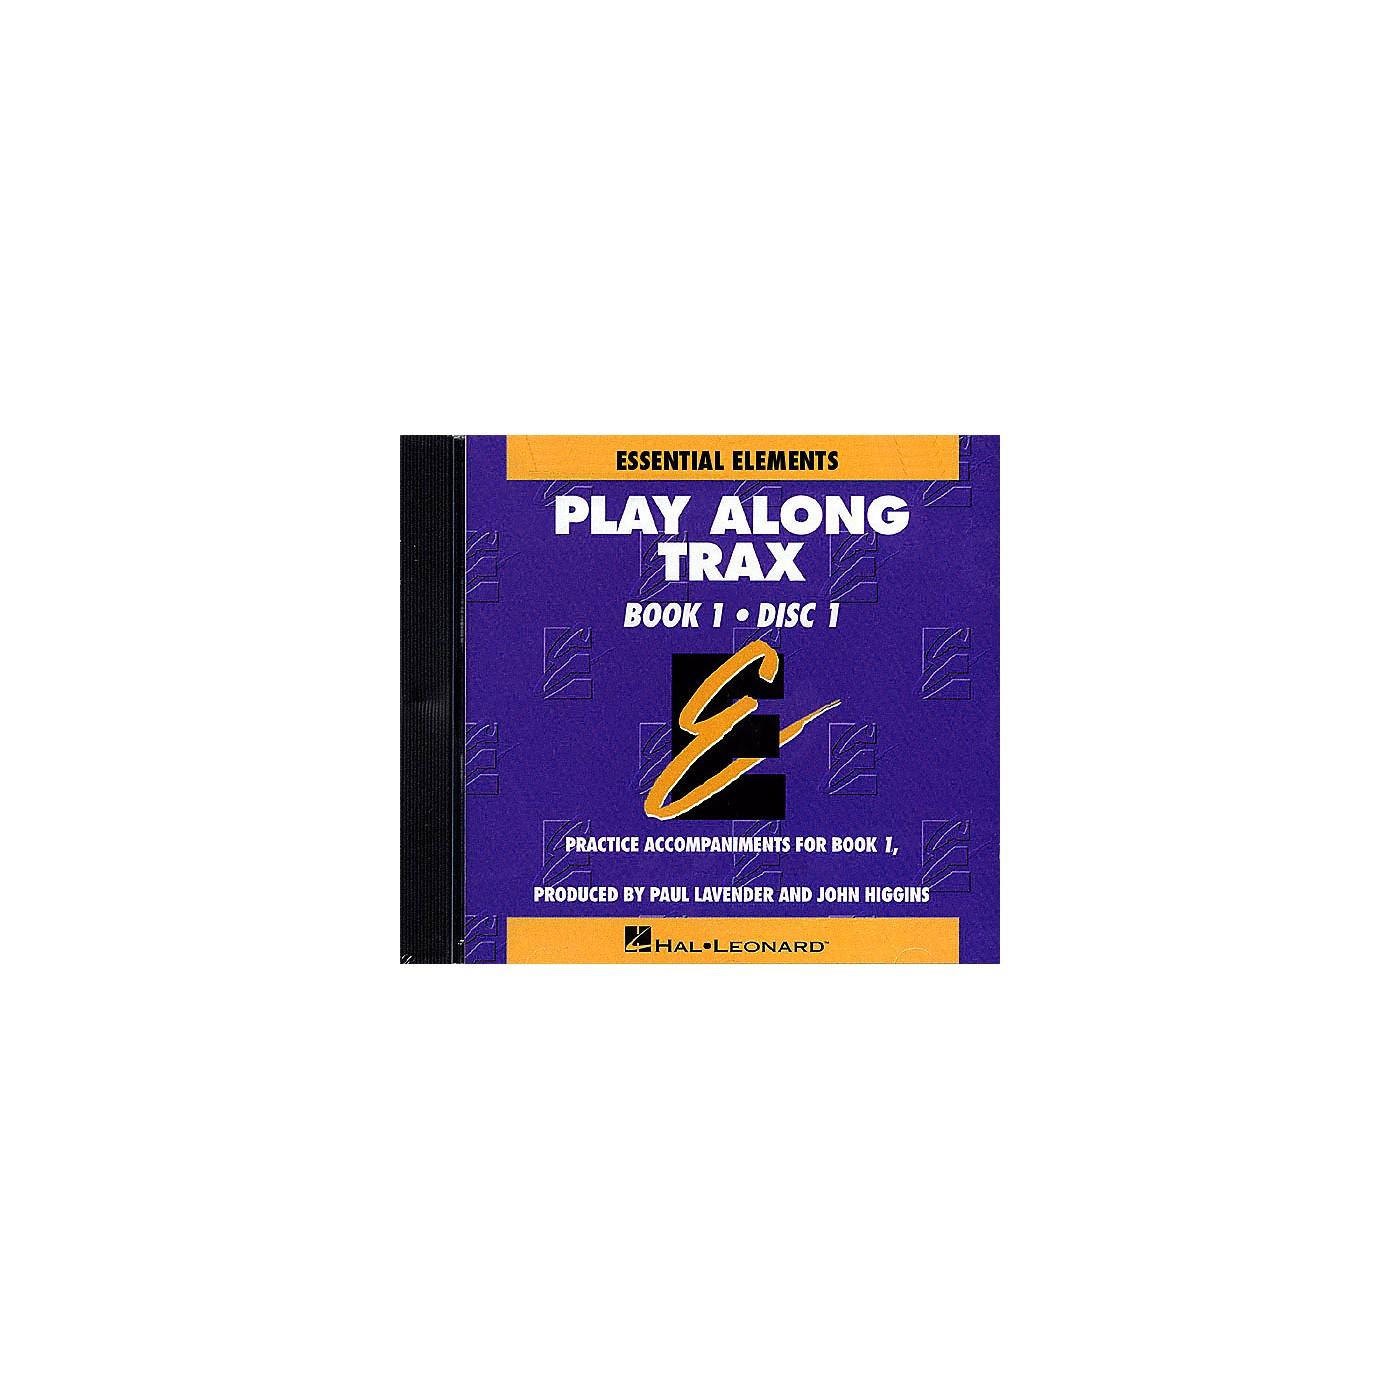 Hal Leonard Essential Elements - Book 1 (Original Series) (Play Along Trax (2-CD set)) Concert Band thumbnail